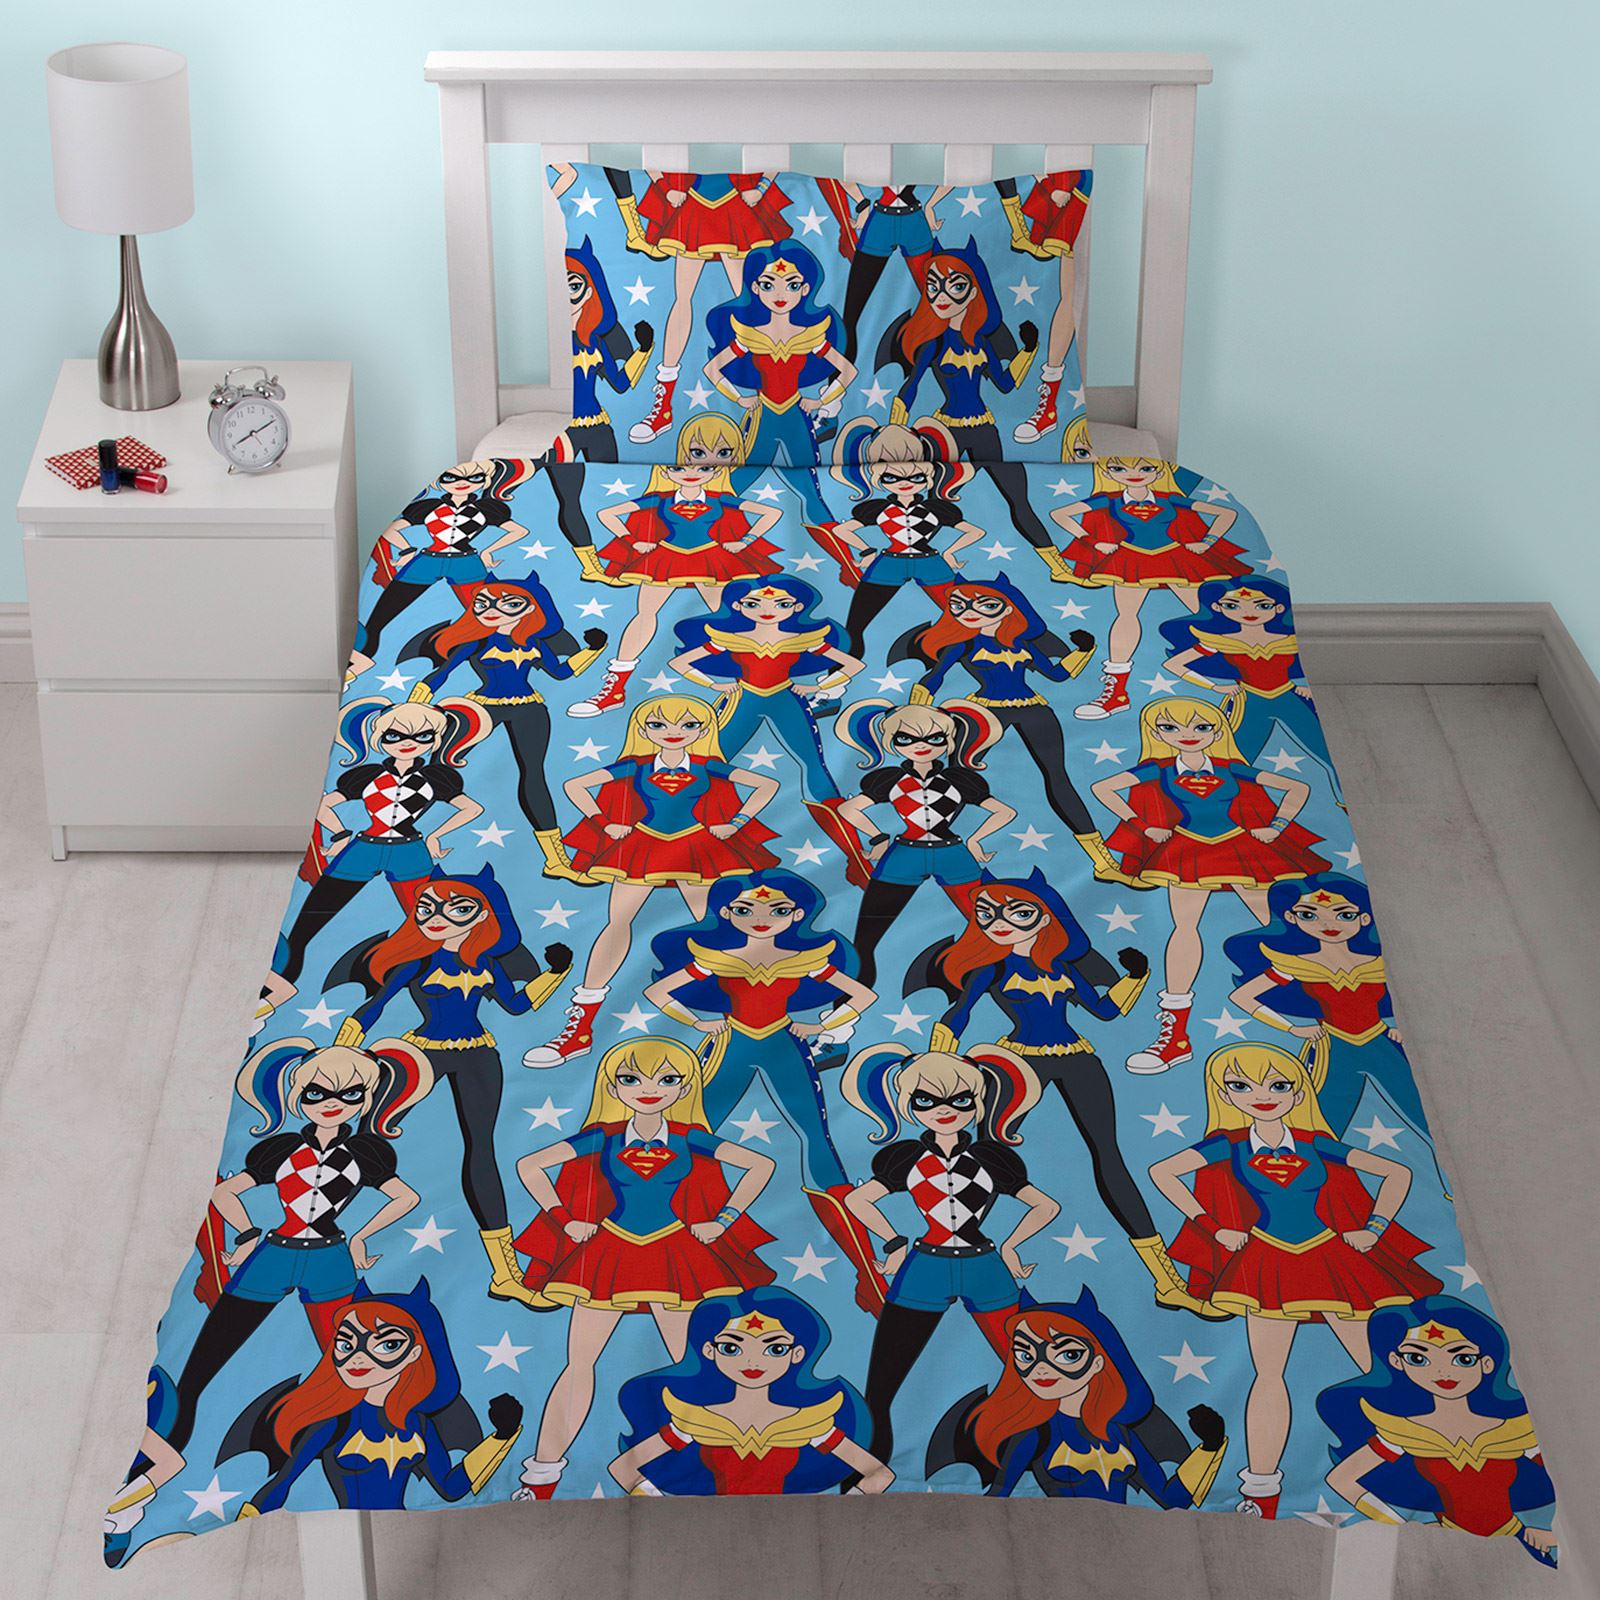 Batgirl Bedding Set